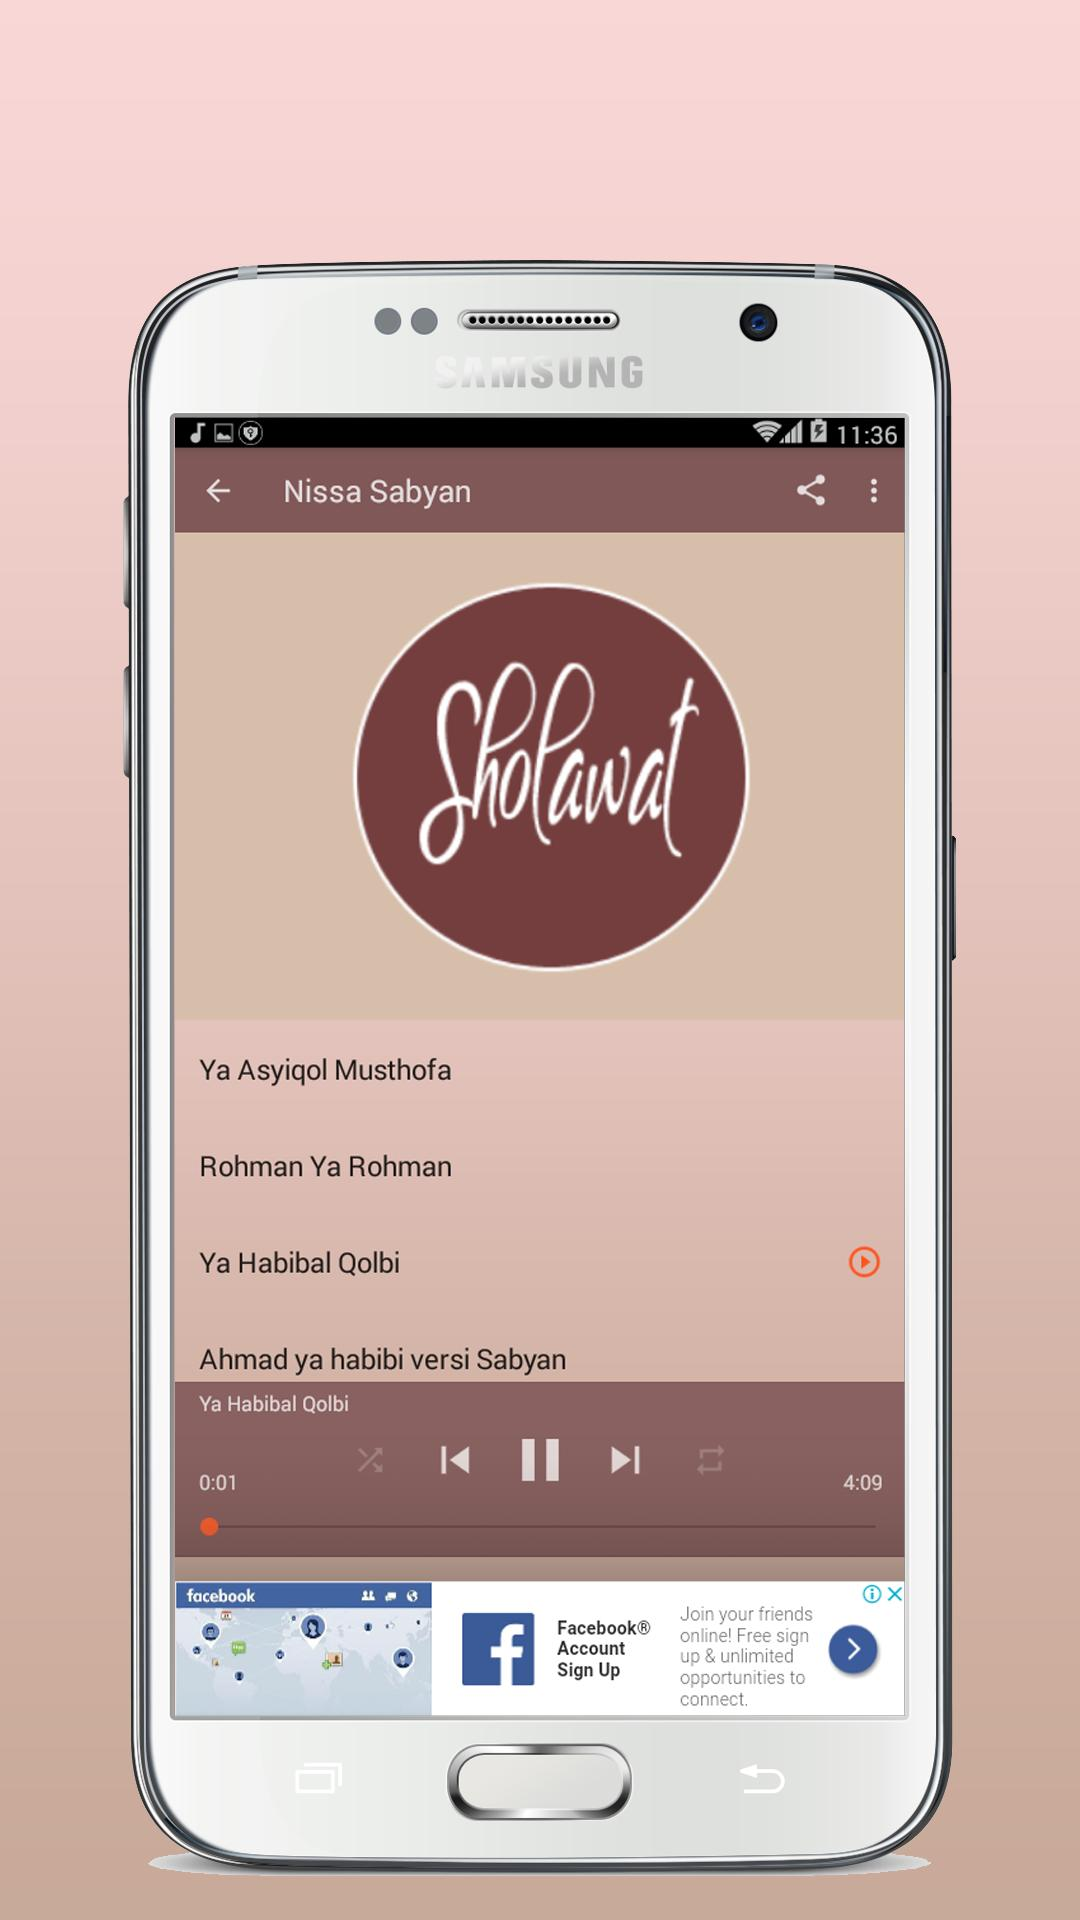 download lagu nissa sabyan rohman ya rohman versi koplo